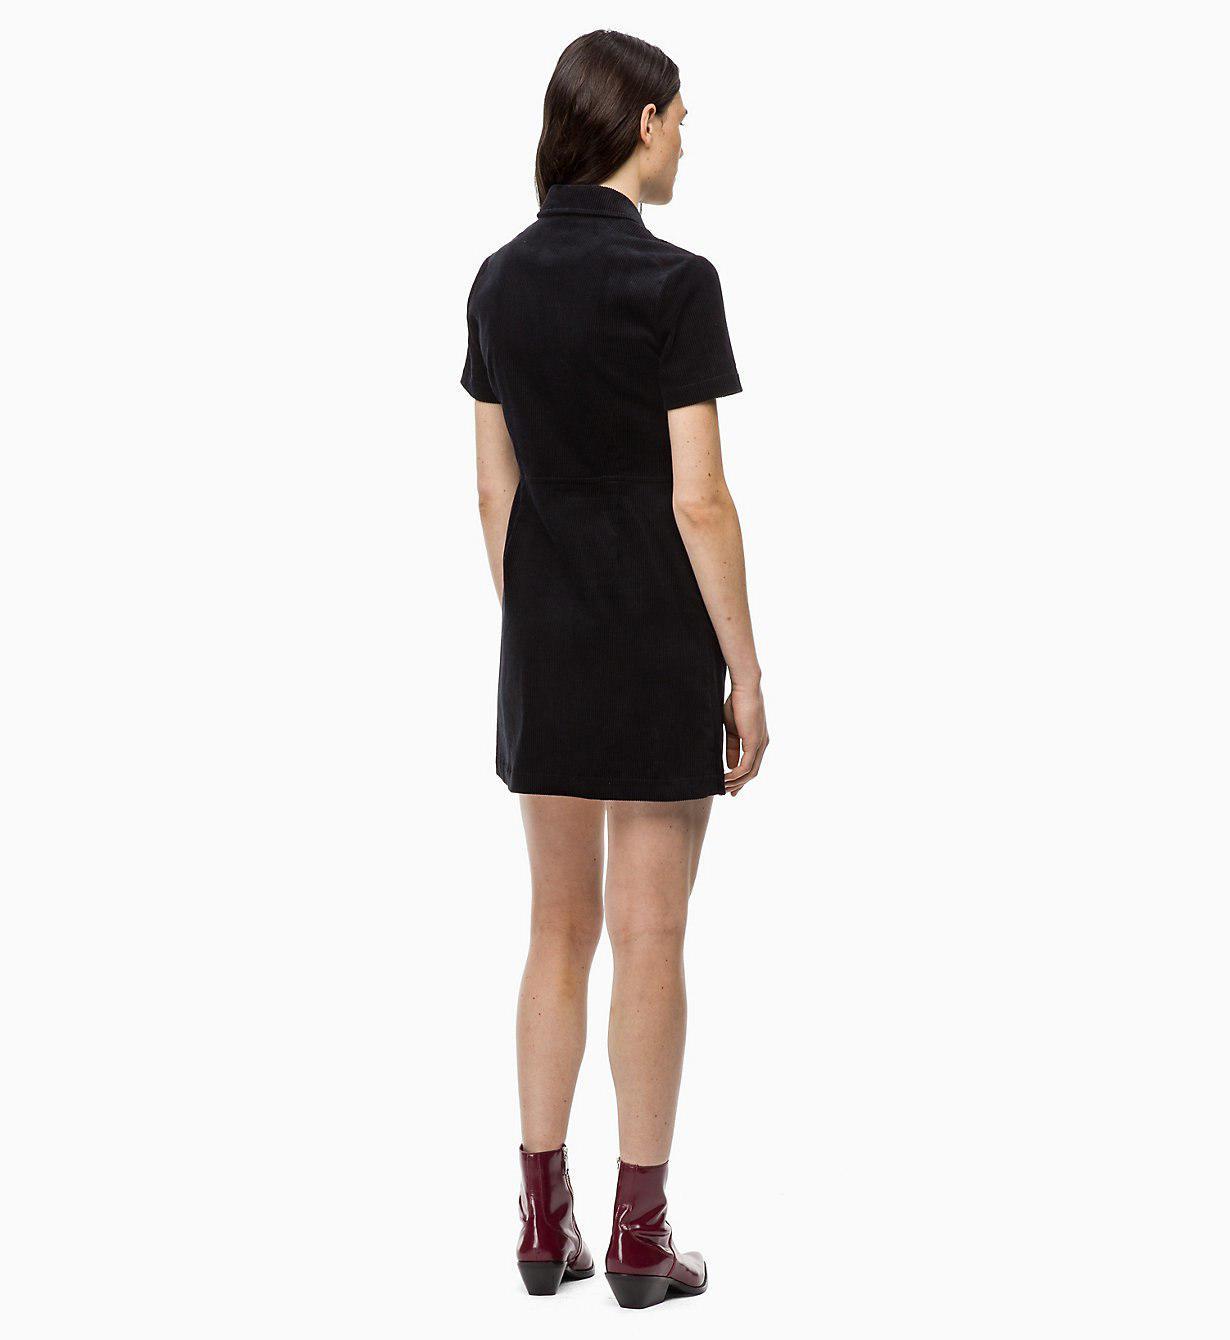 9183fe18a39 Calvin Klein Corduroy Zip-up Dress in Black - Lyst